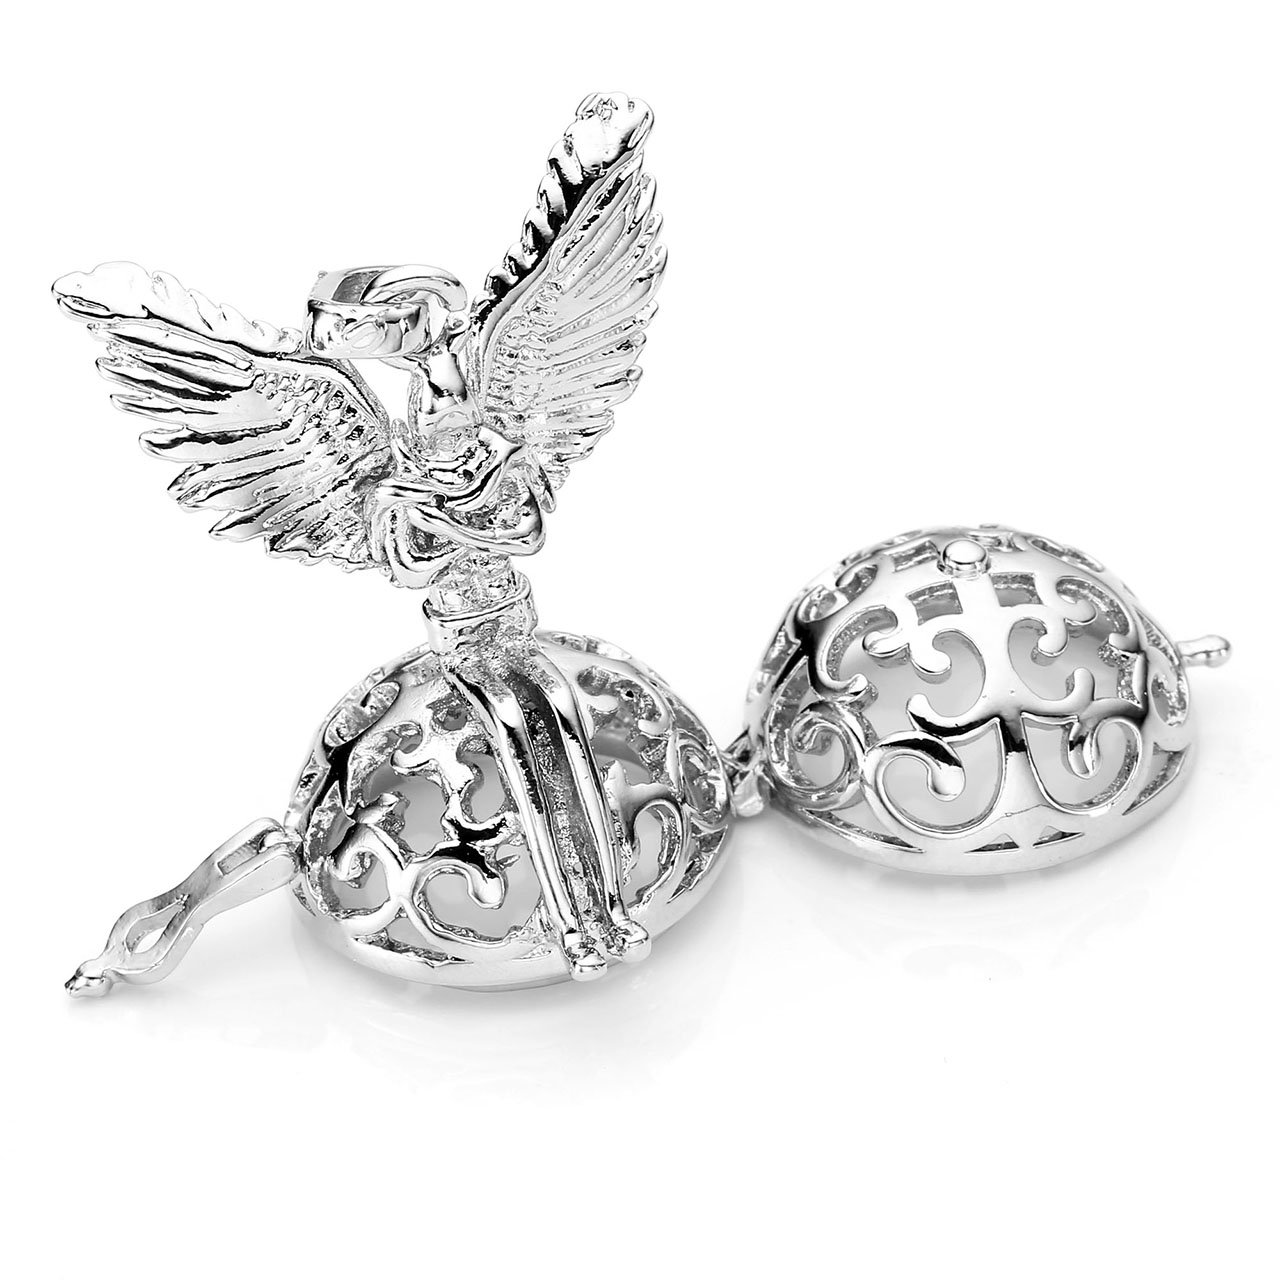 JOVIVI Engelrufer Anhänger Set,Verkündigung Engel Käfig Locket Anhänger 7x Ø 16mm Steinkugeln mit 7 Chakra Halskette